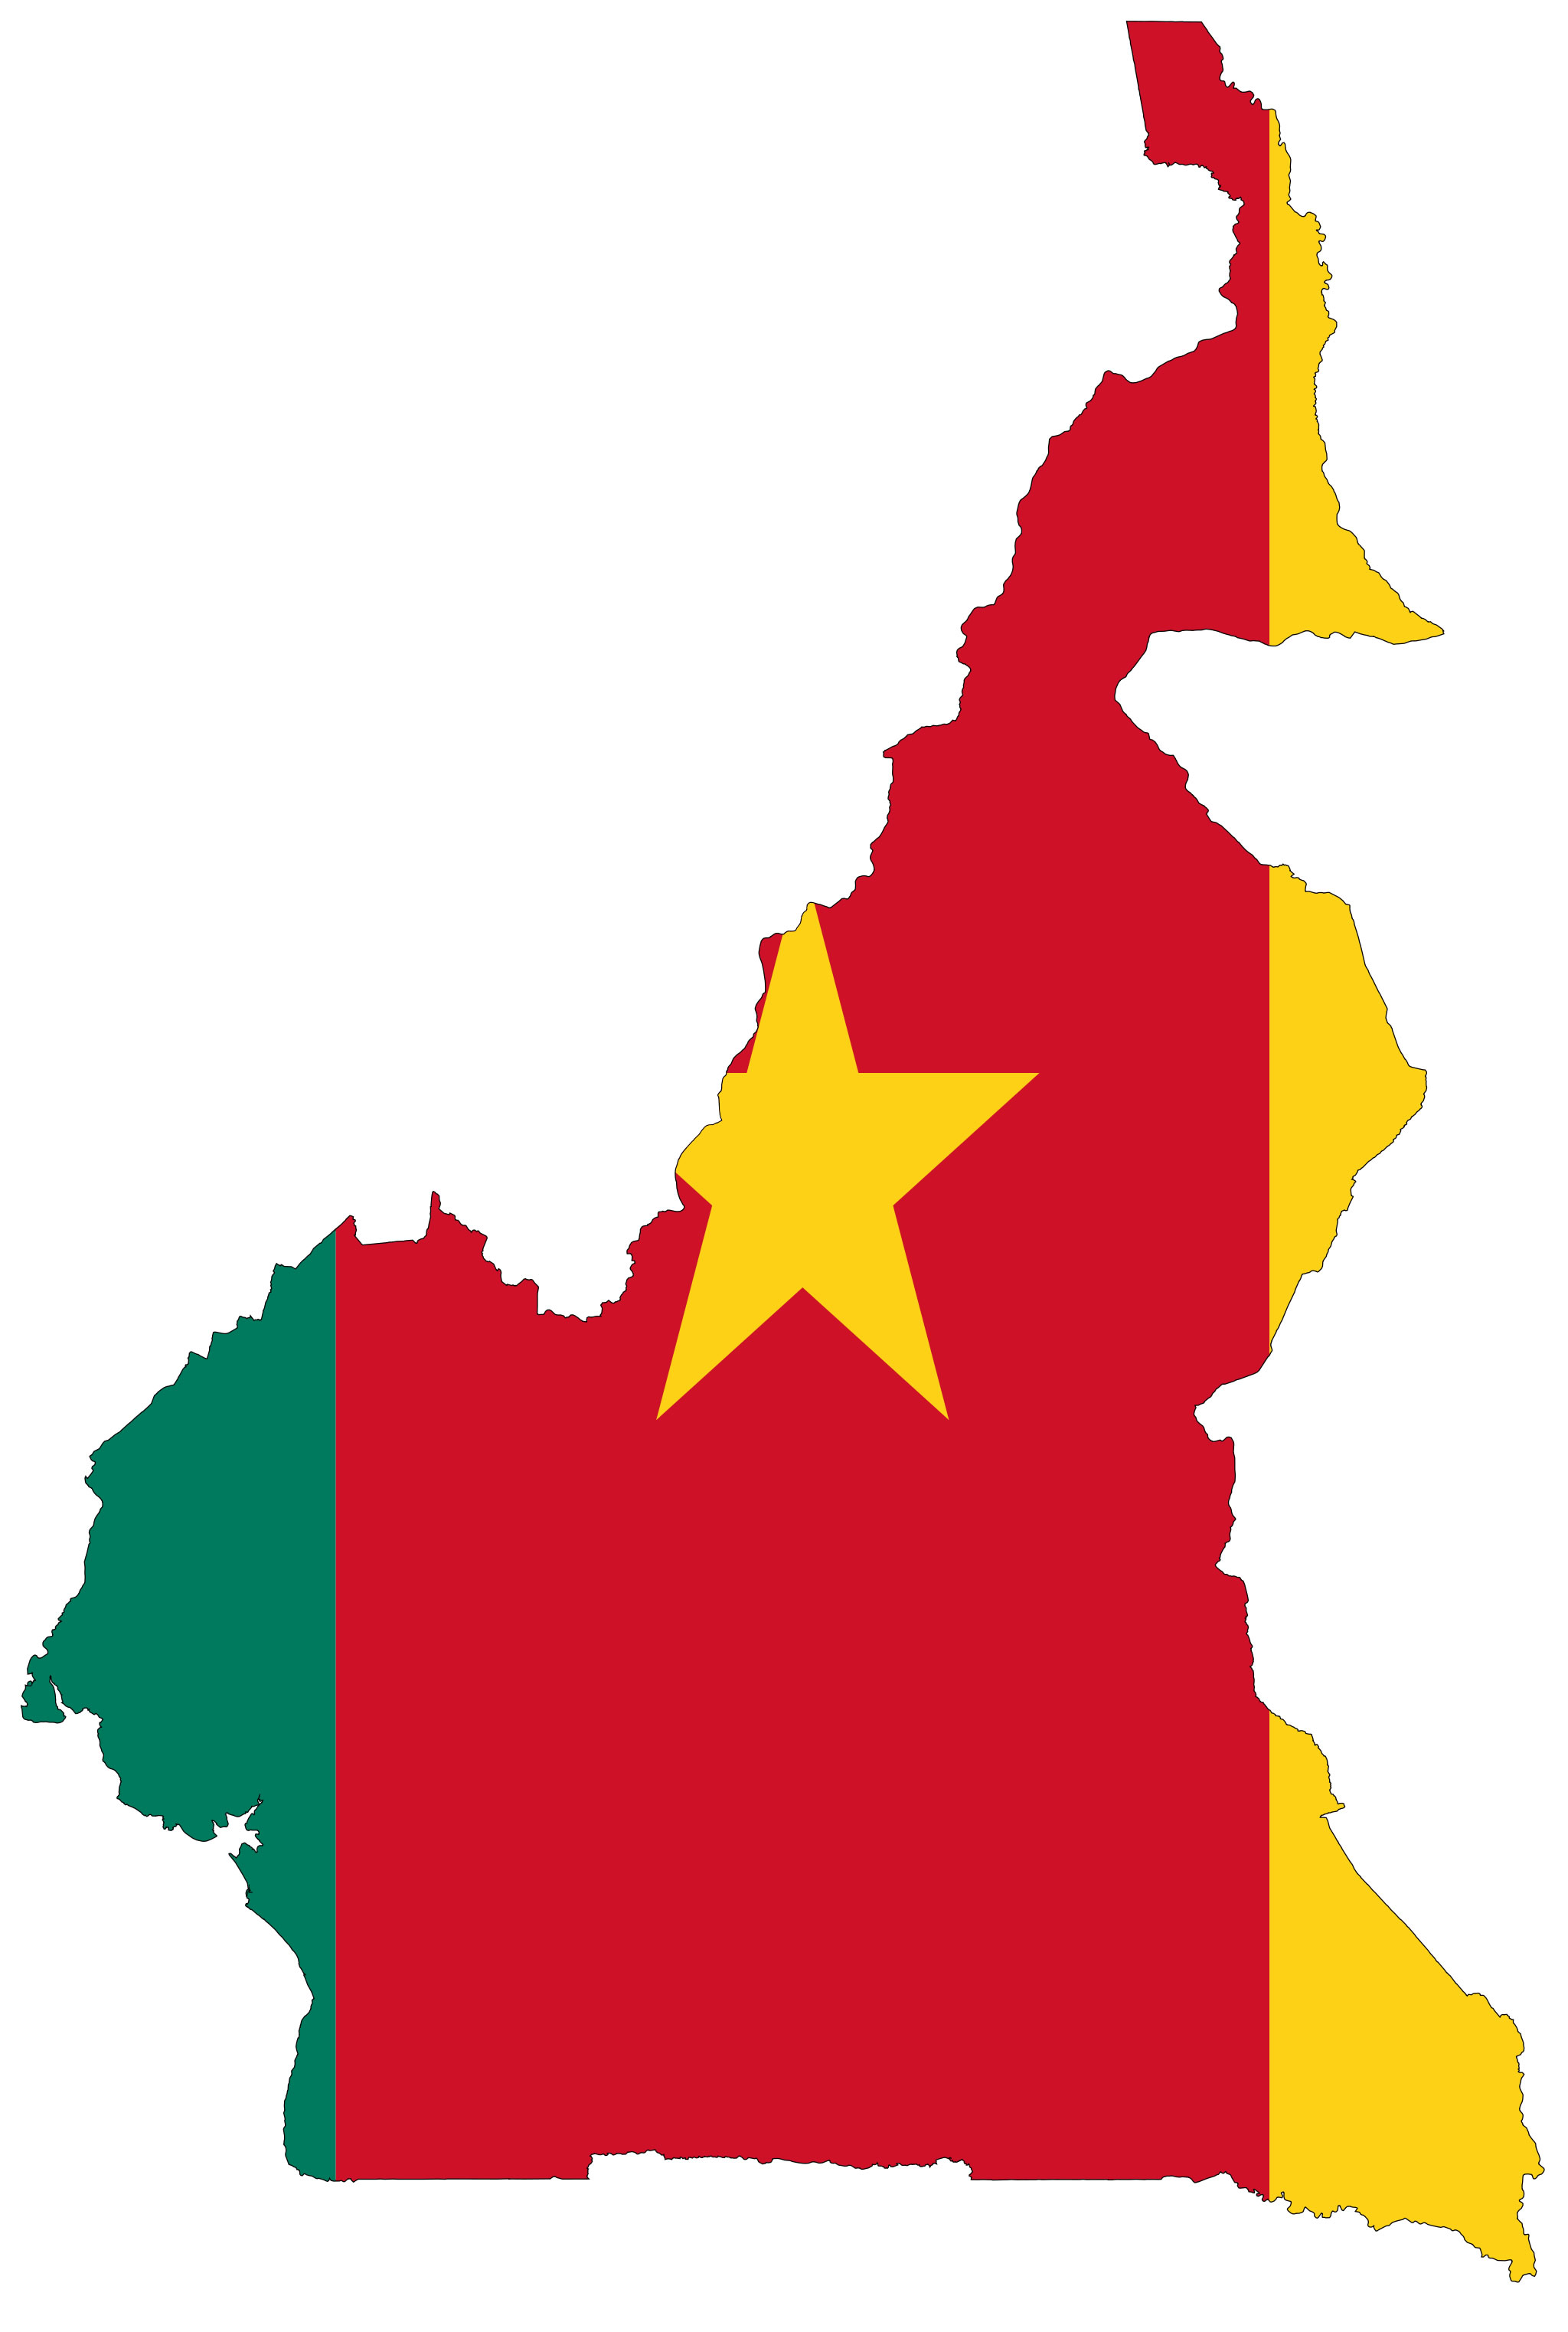 http://www.carte-du-monde.net/pays/cameroun/carte-drapeaux-cameroun.jpg